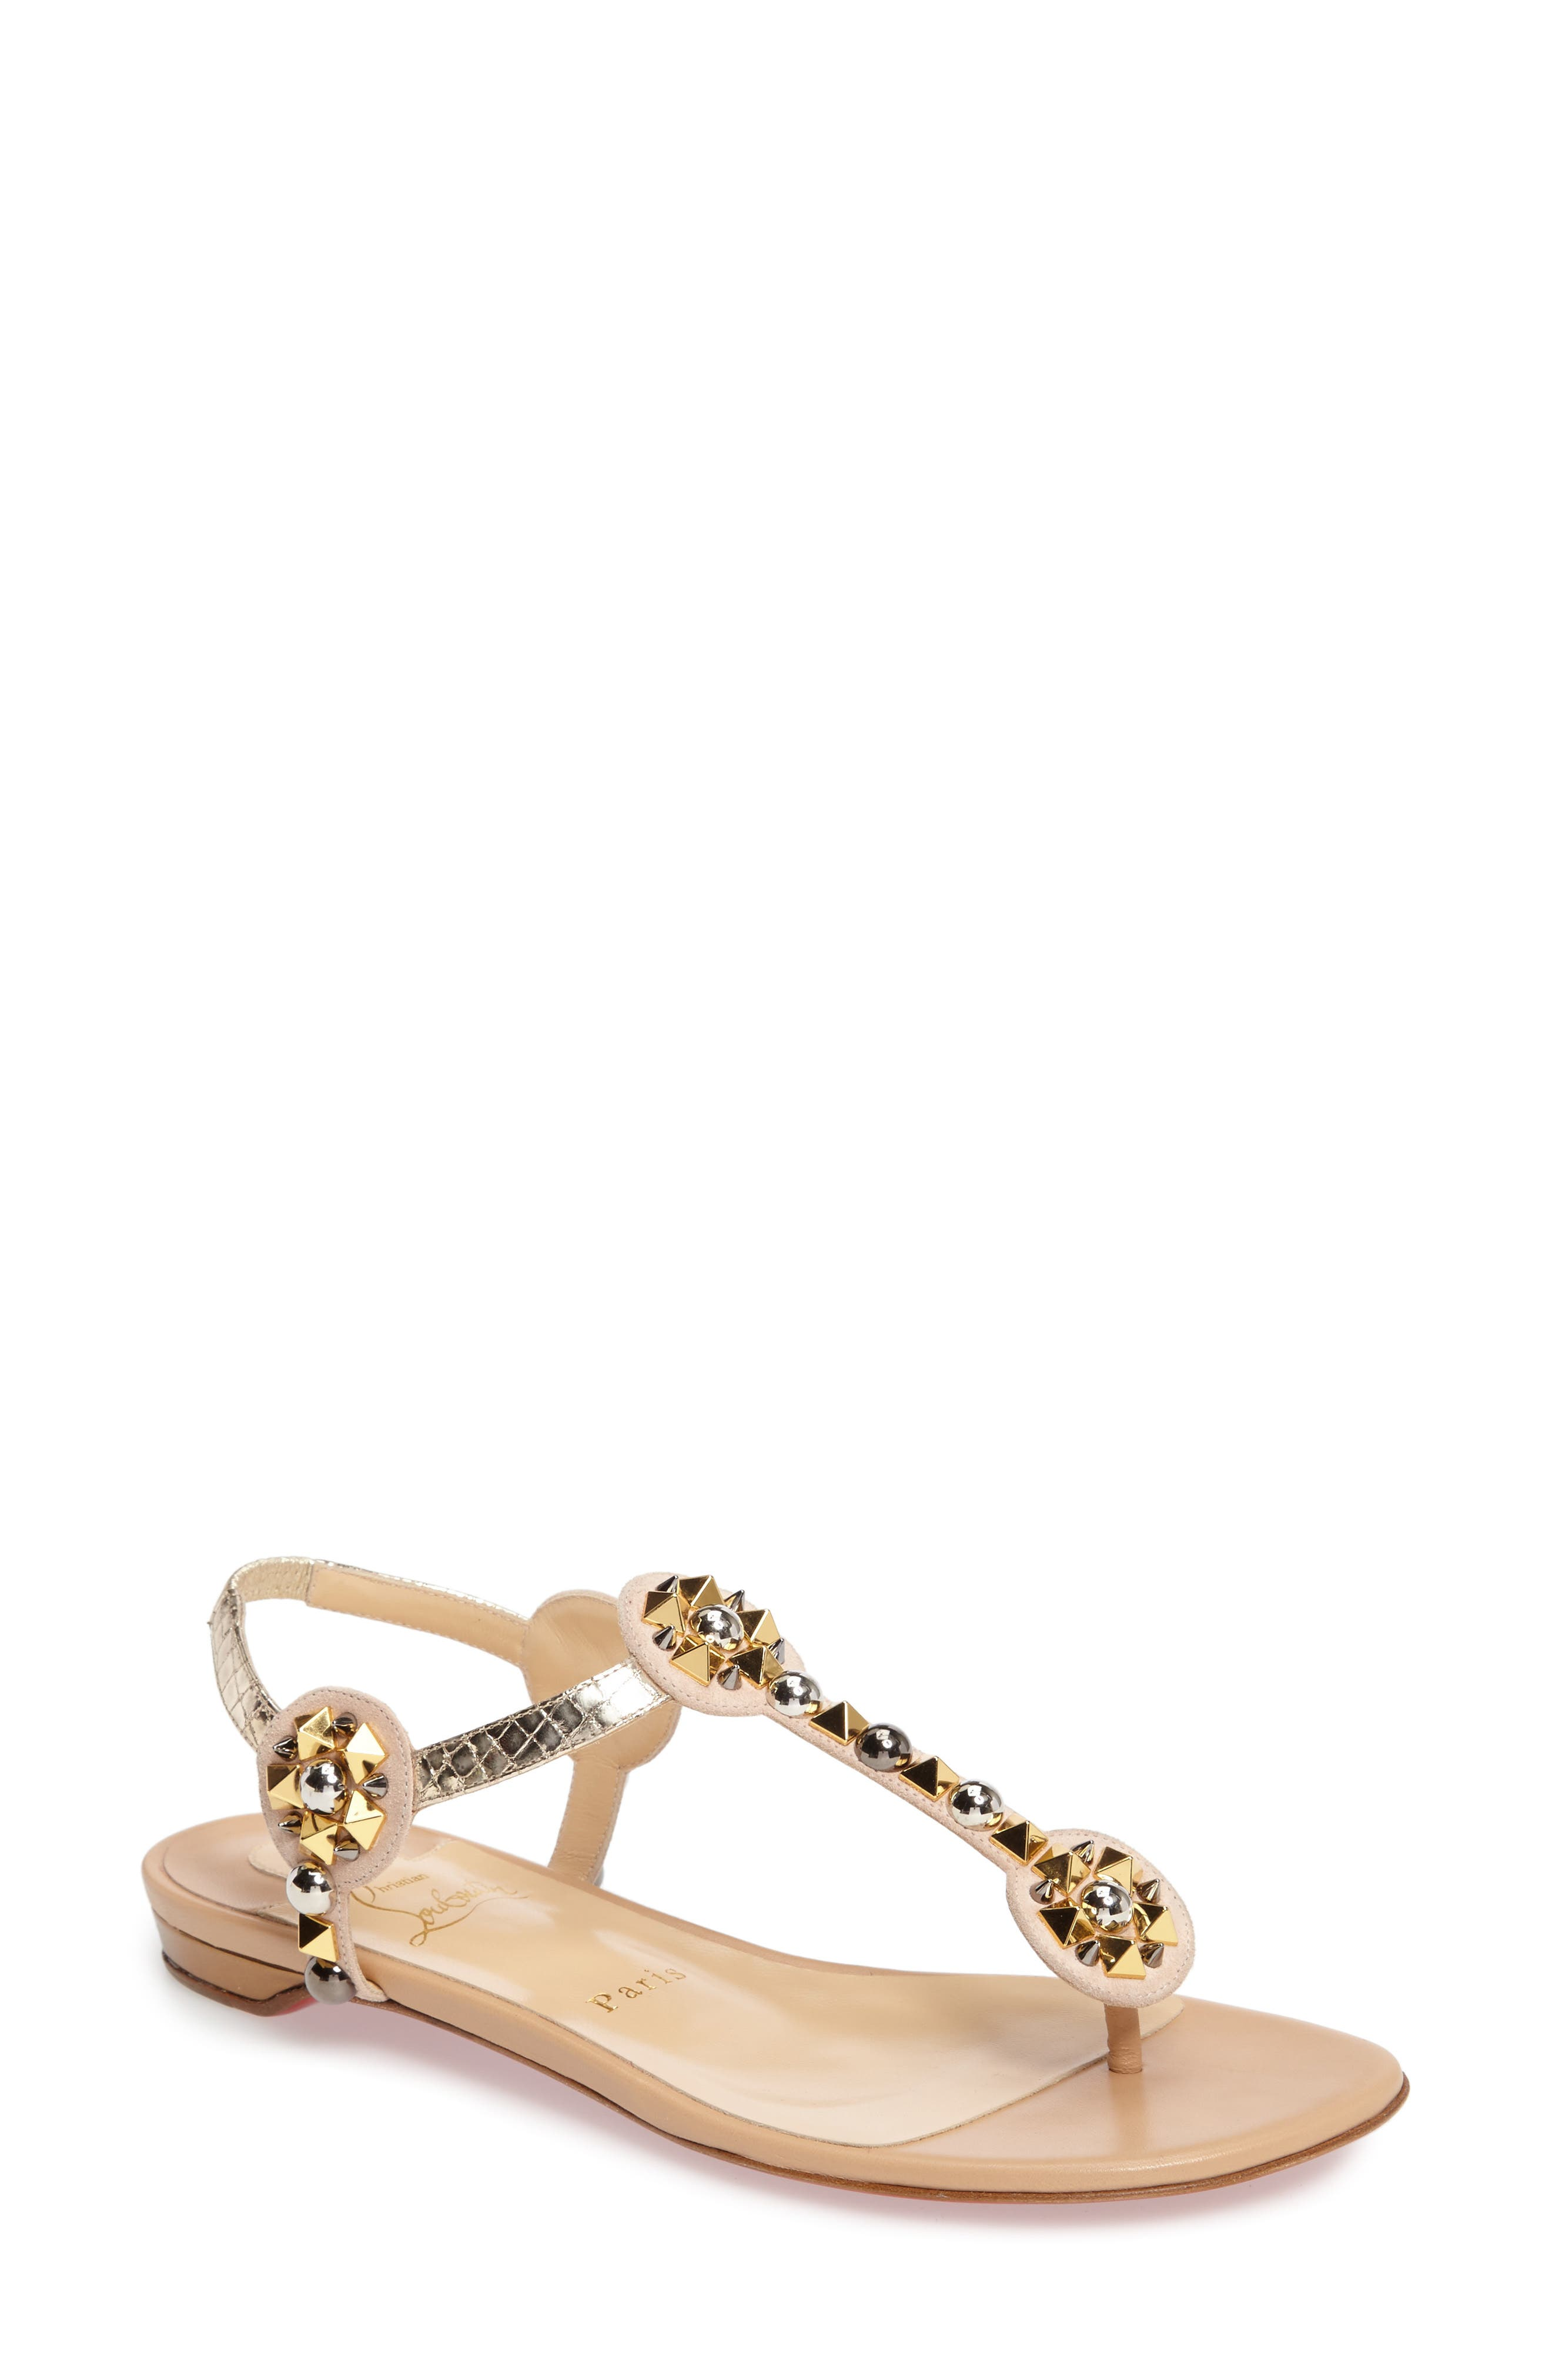 Kaleidra T-Strap Sandal,                         Main,                         color, 250